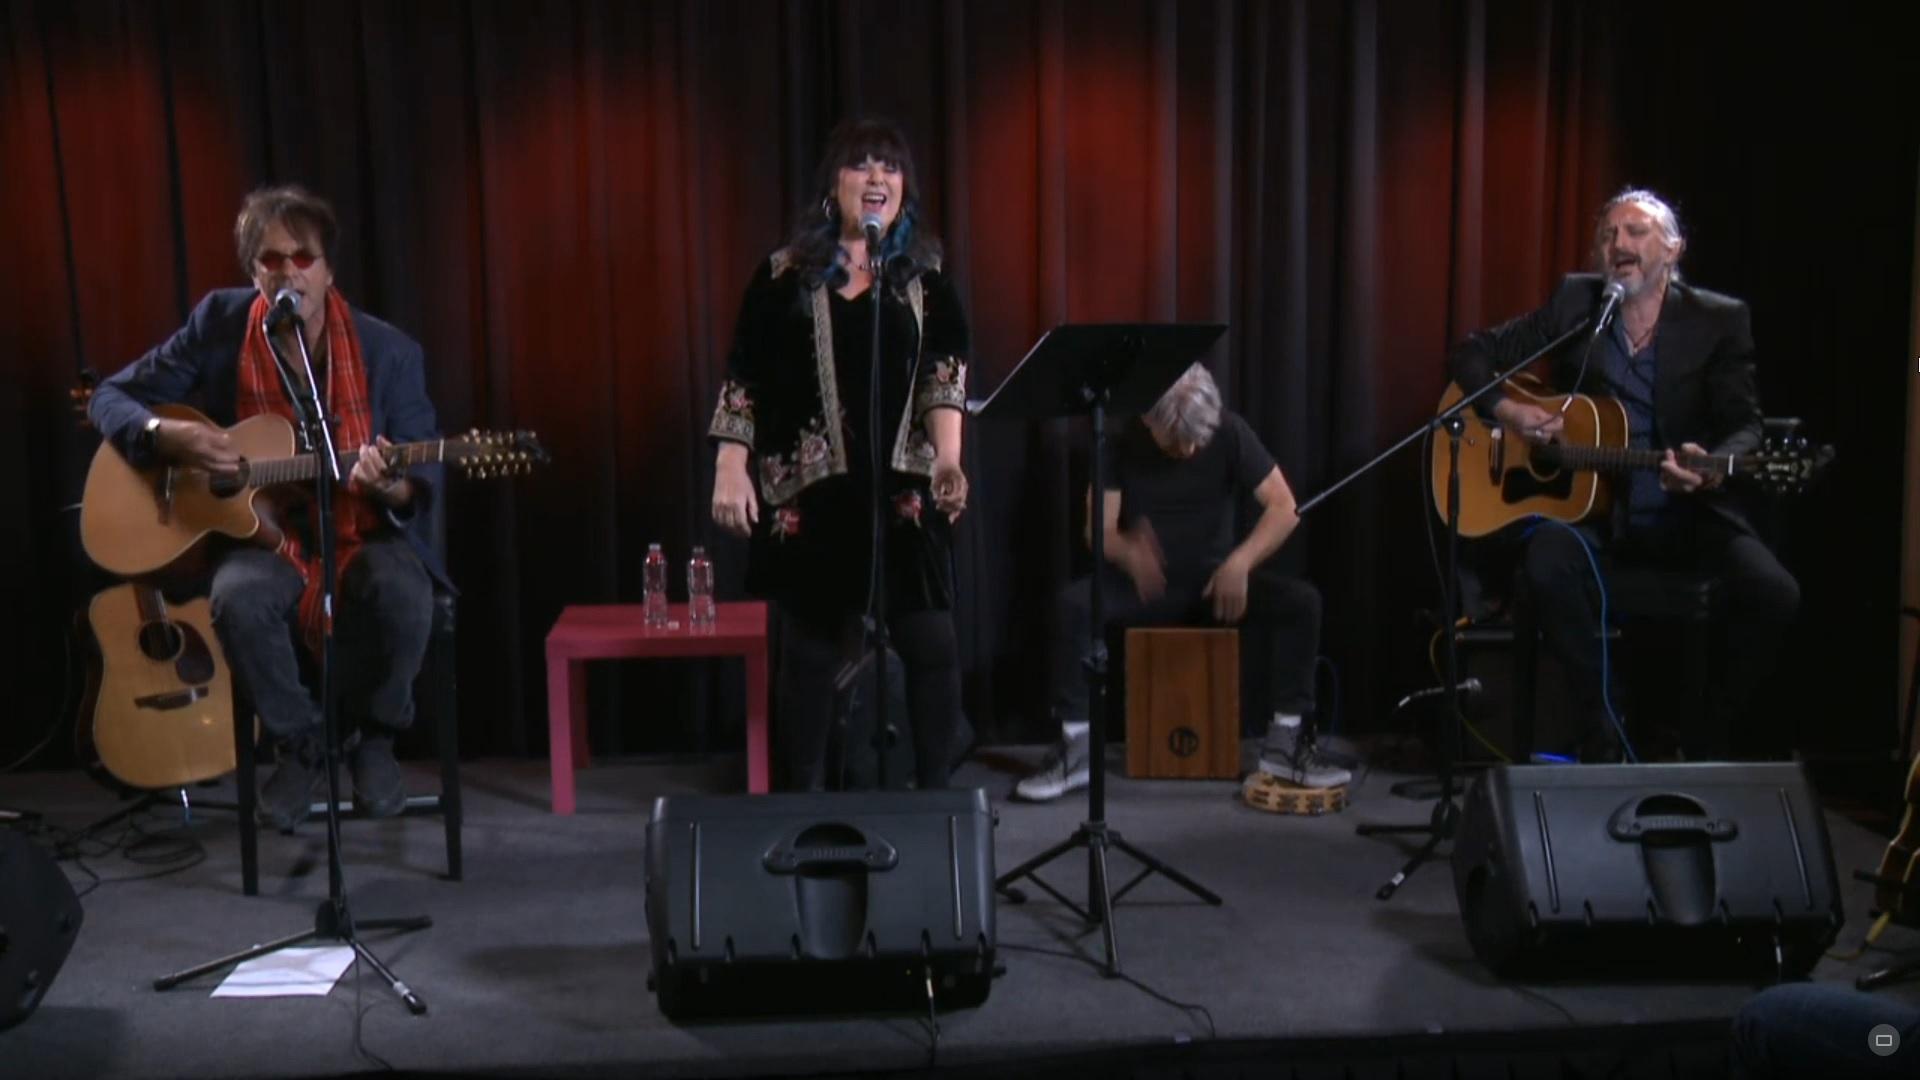 ann wilson live unplugged